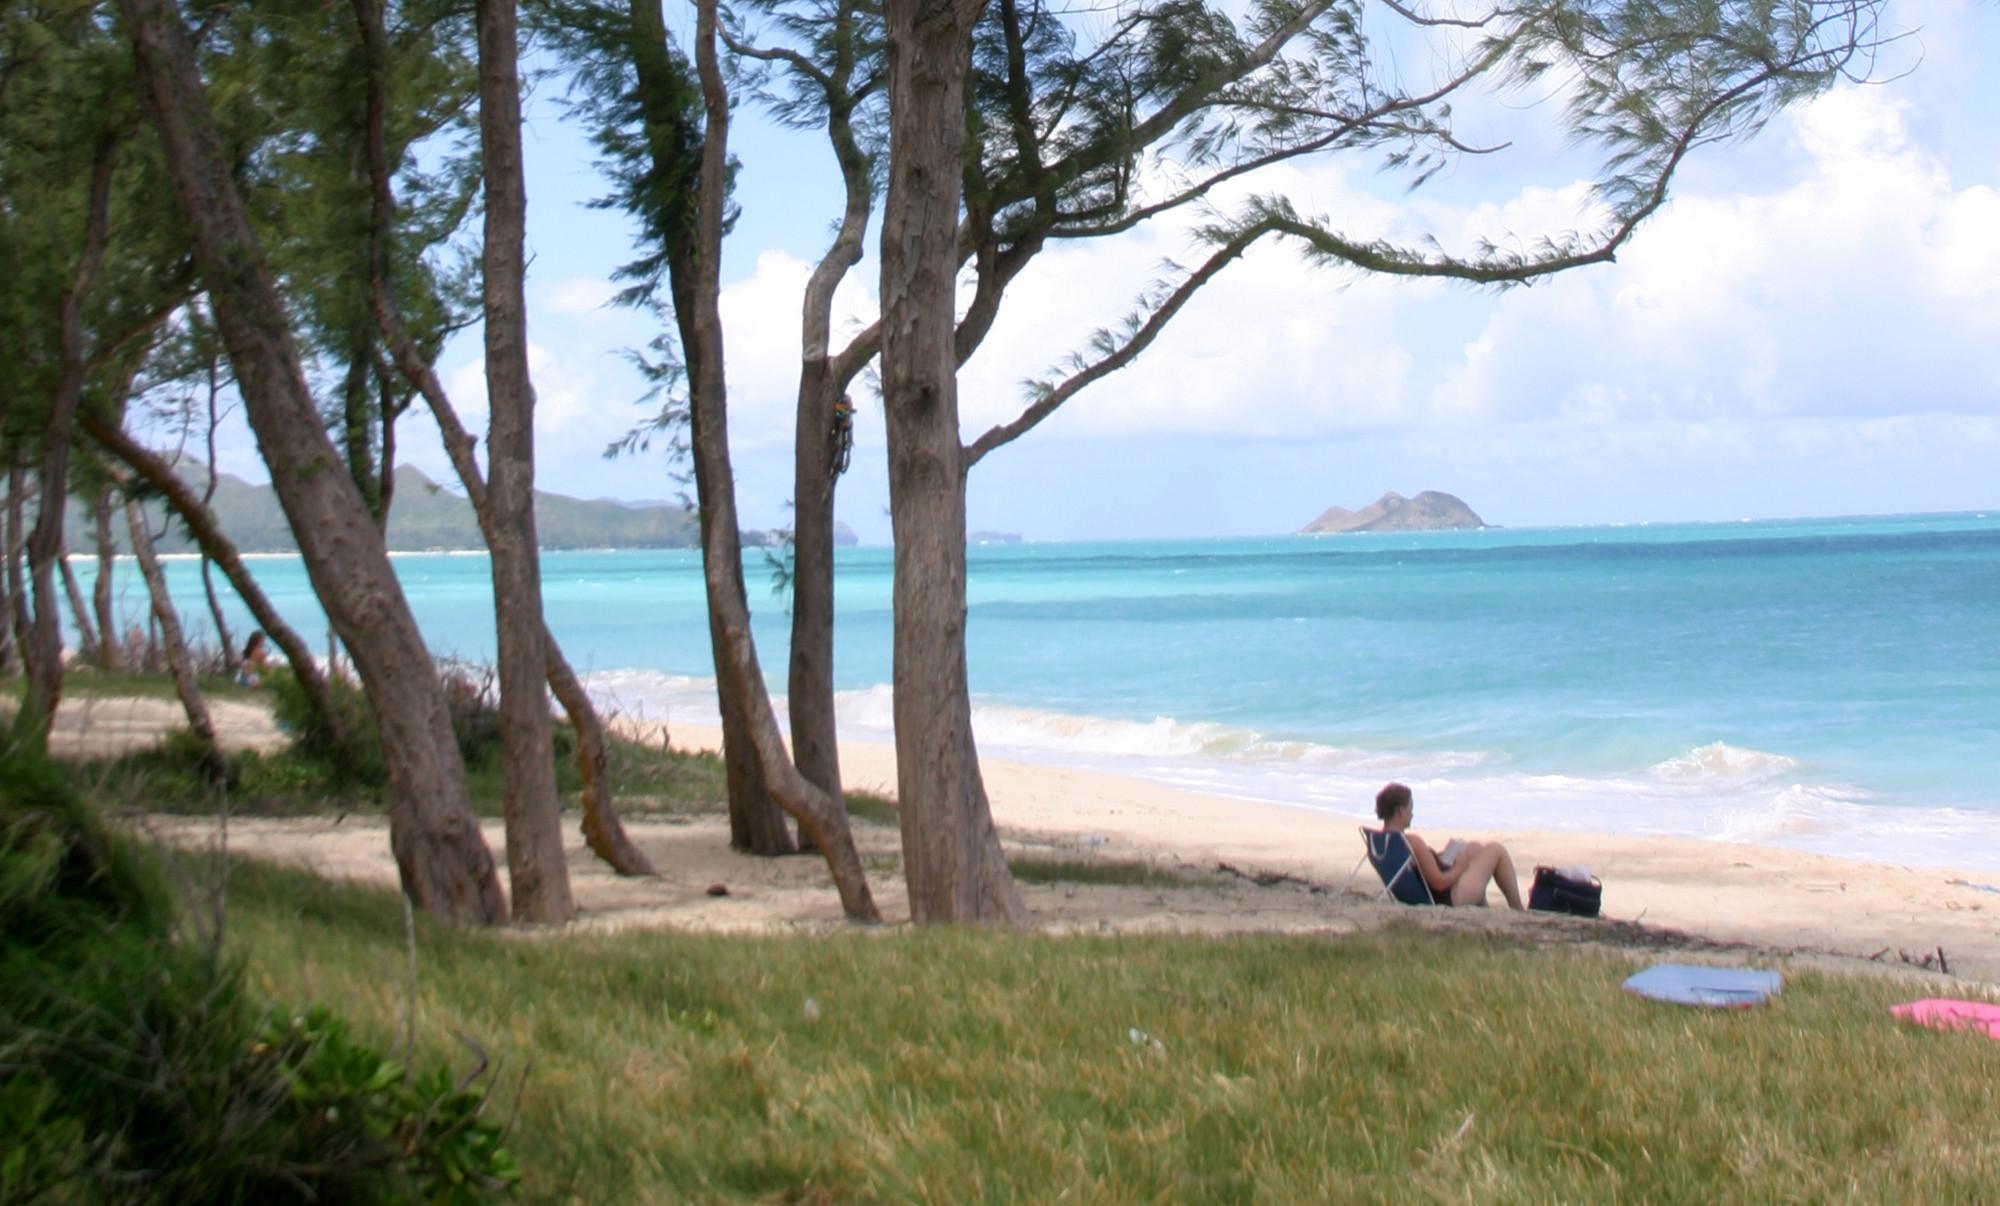 Dr Beach 2015 Hawaii Beach Takes Top Spot While Florida Lands Four In Top 10 Orlando Sentinel